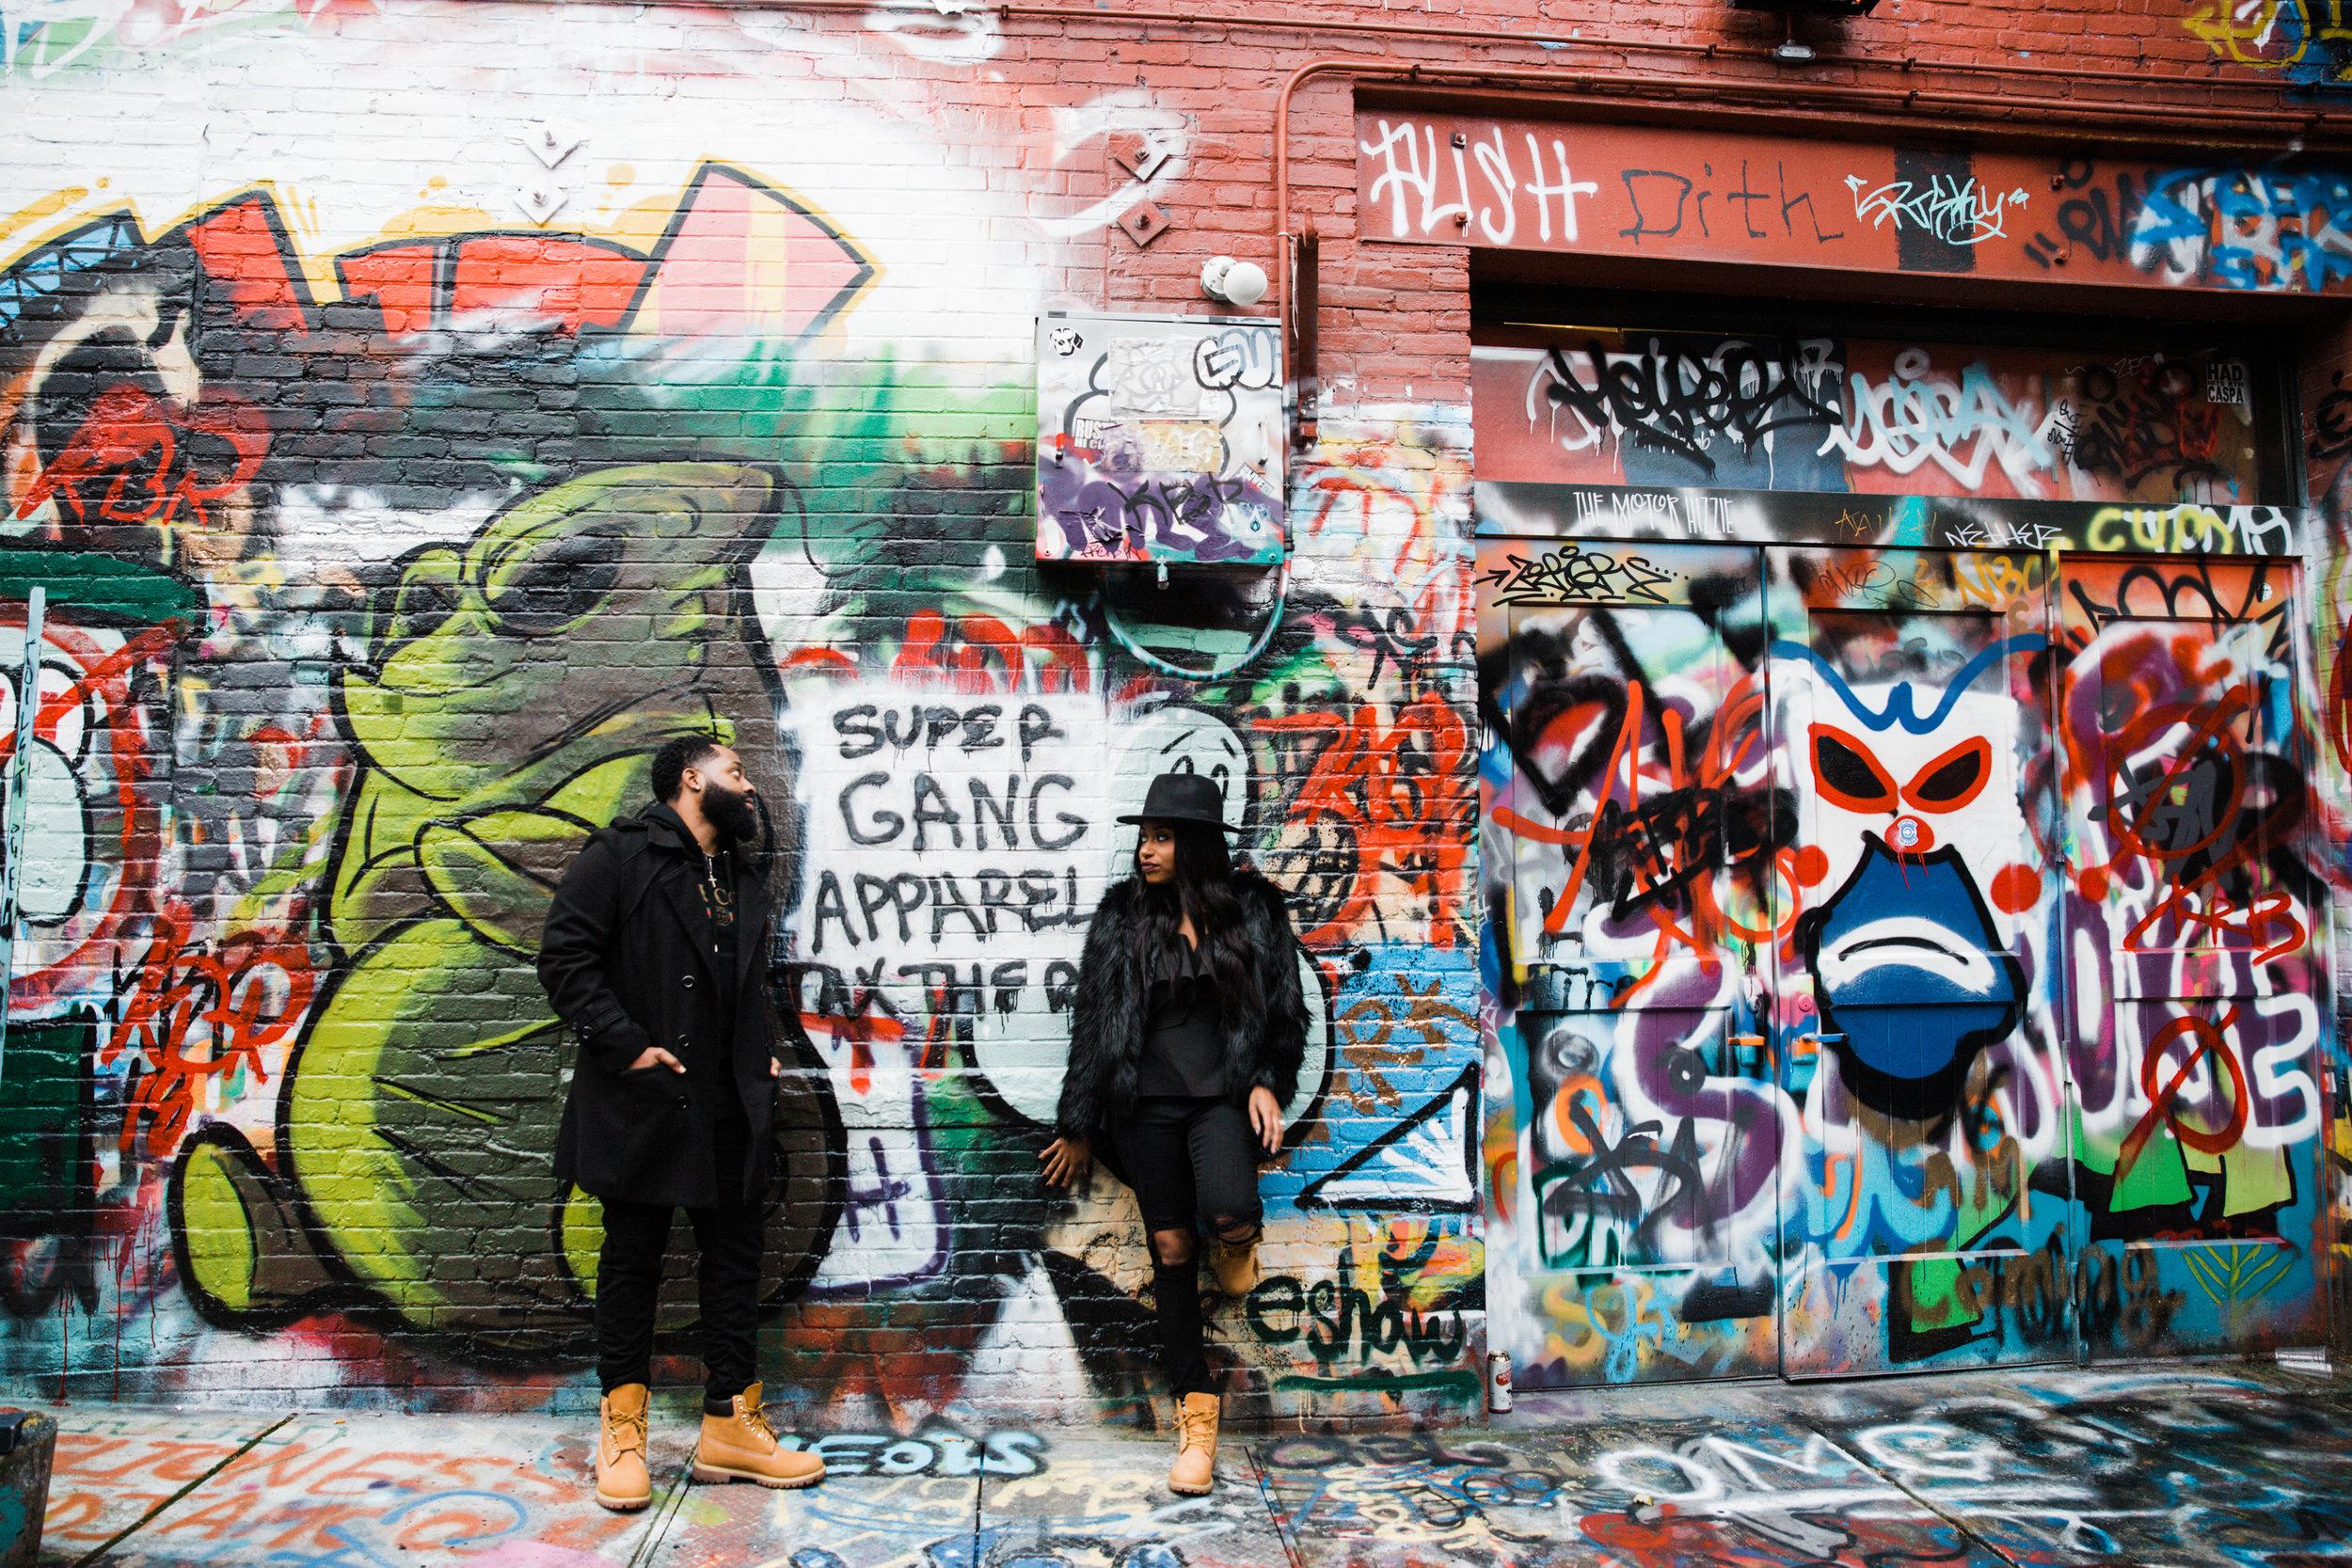 Creative Baltimore Graffiti Alley Engagement Session Megapixels Media Photography-42.jpg